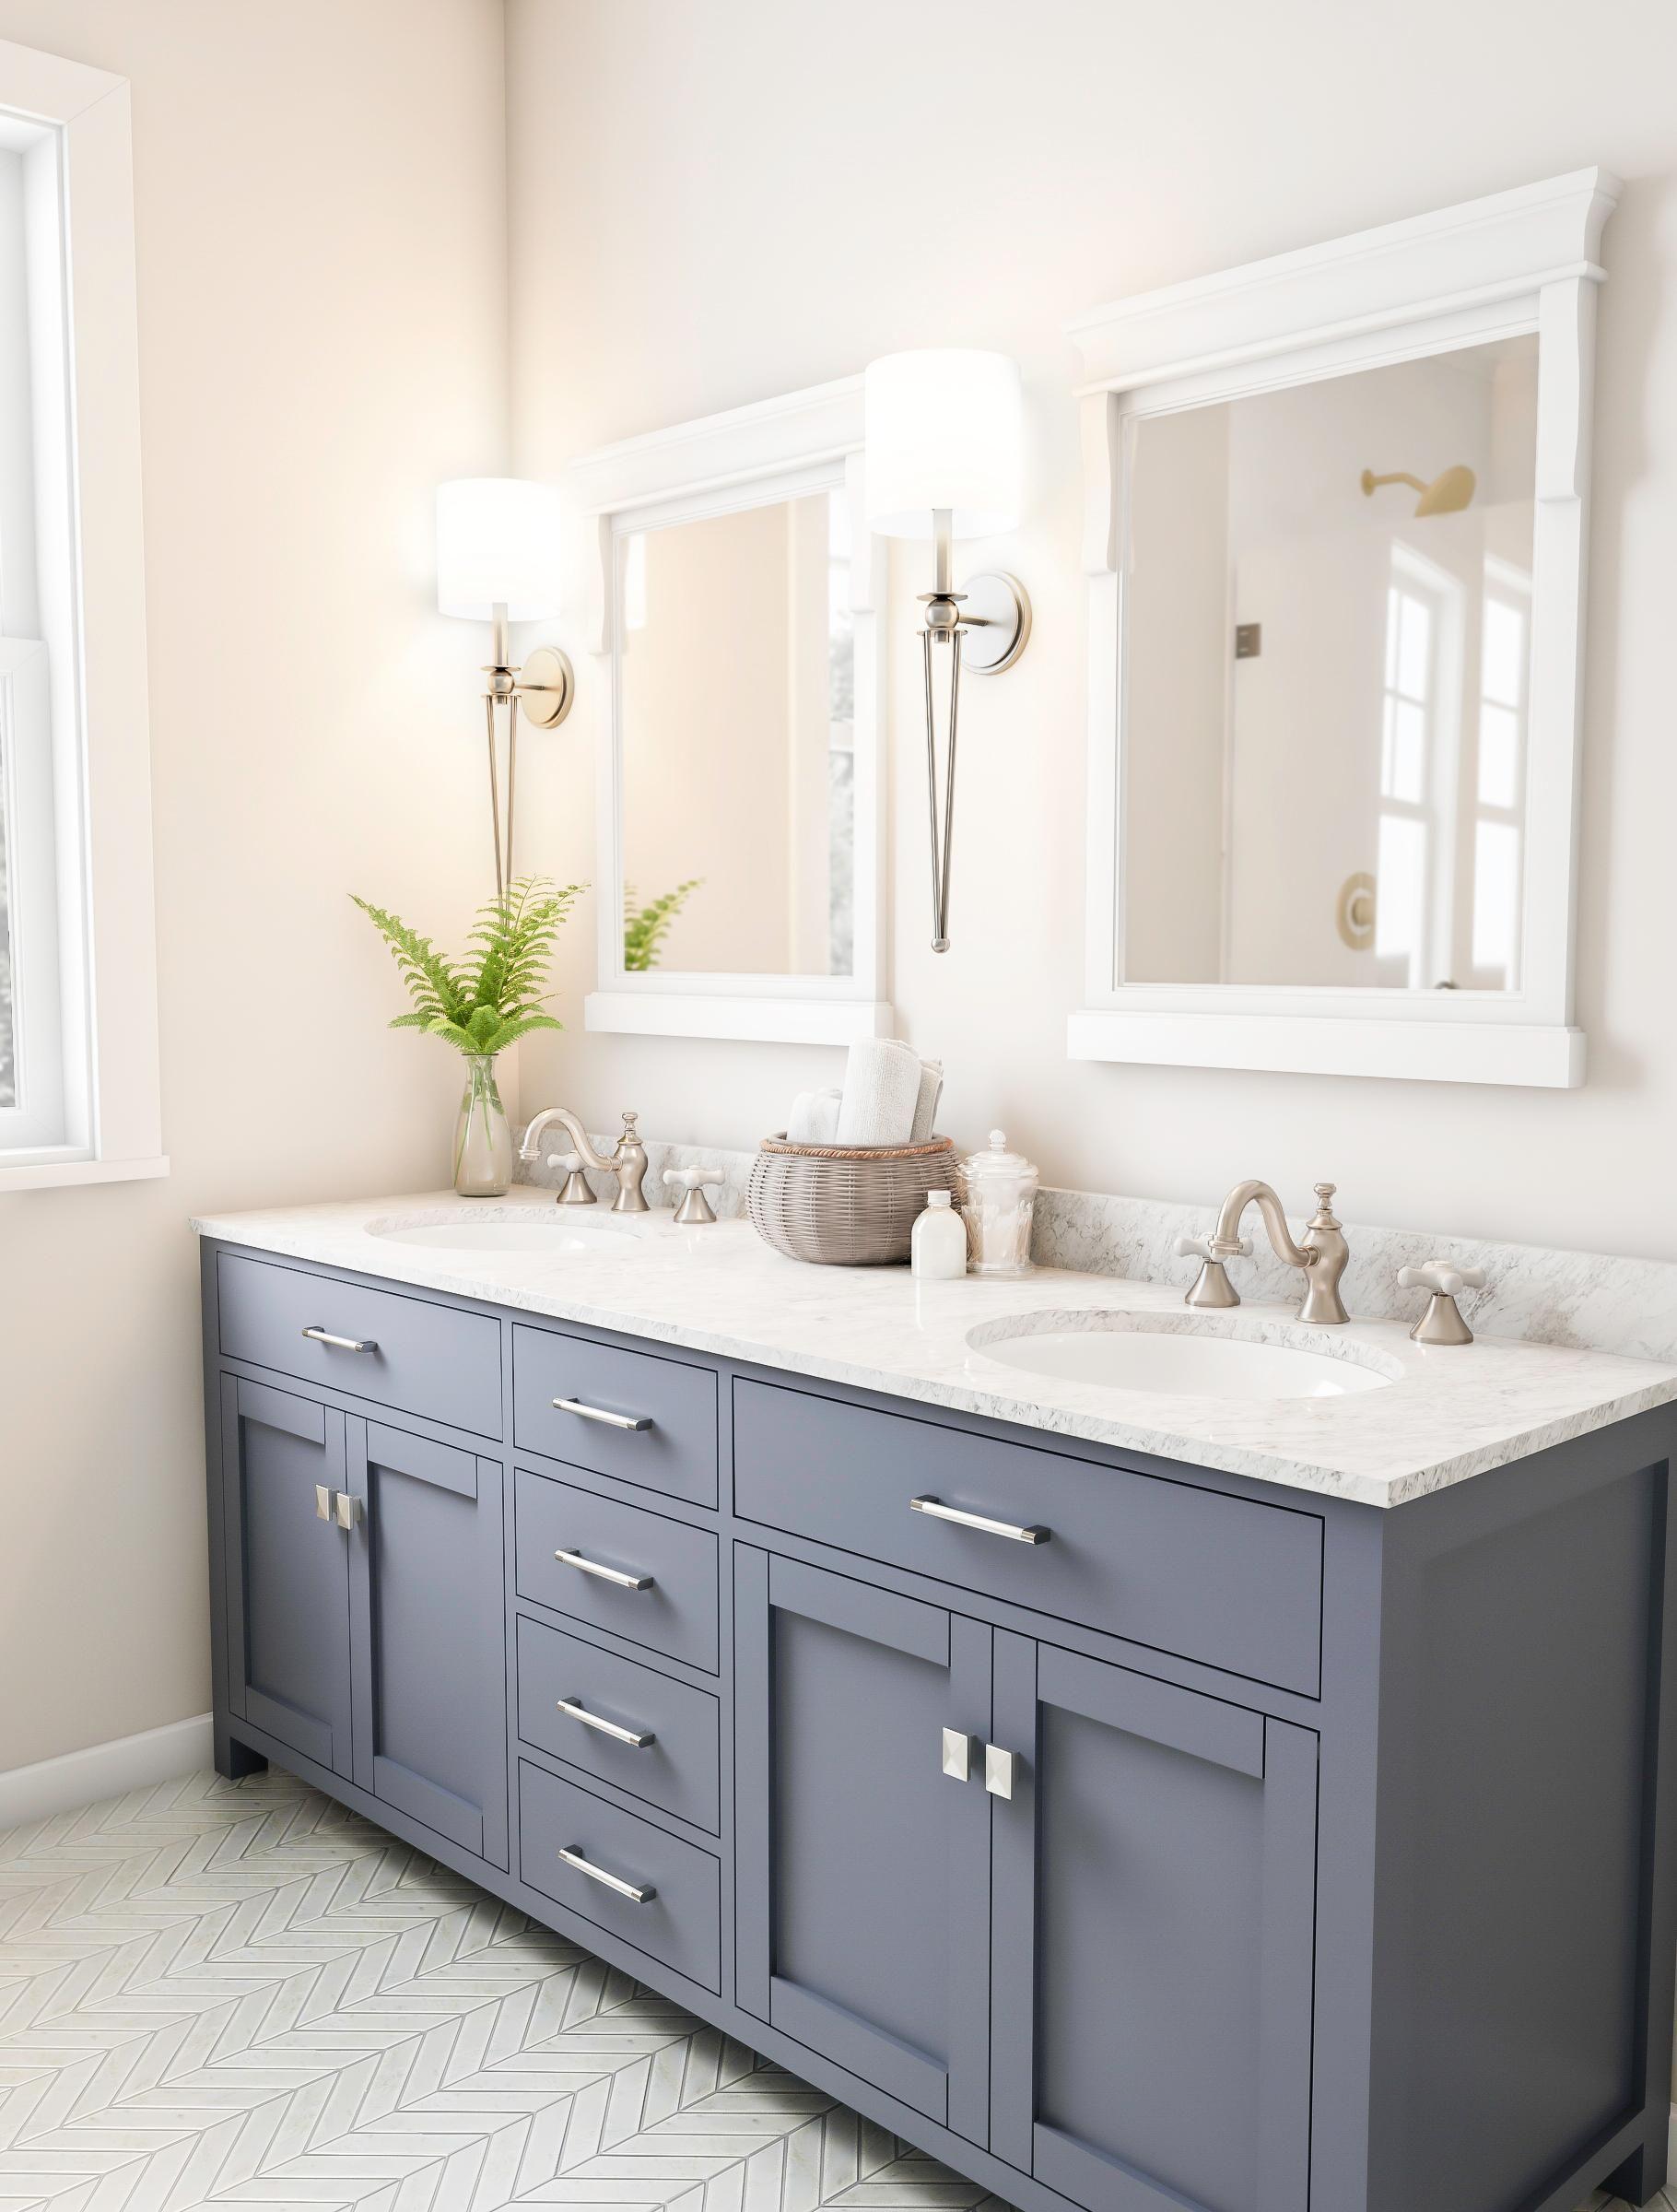 Slate Gray Double Bathroom Sinks Bathrooms Remodel Small Bathroom Remodel Blue Bathroom Decor